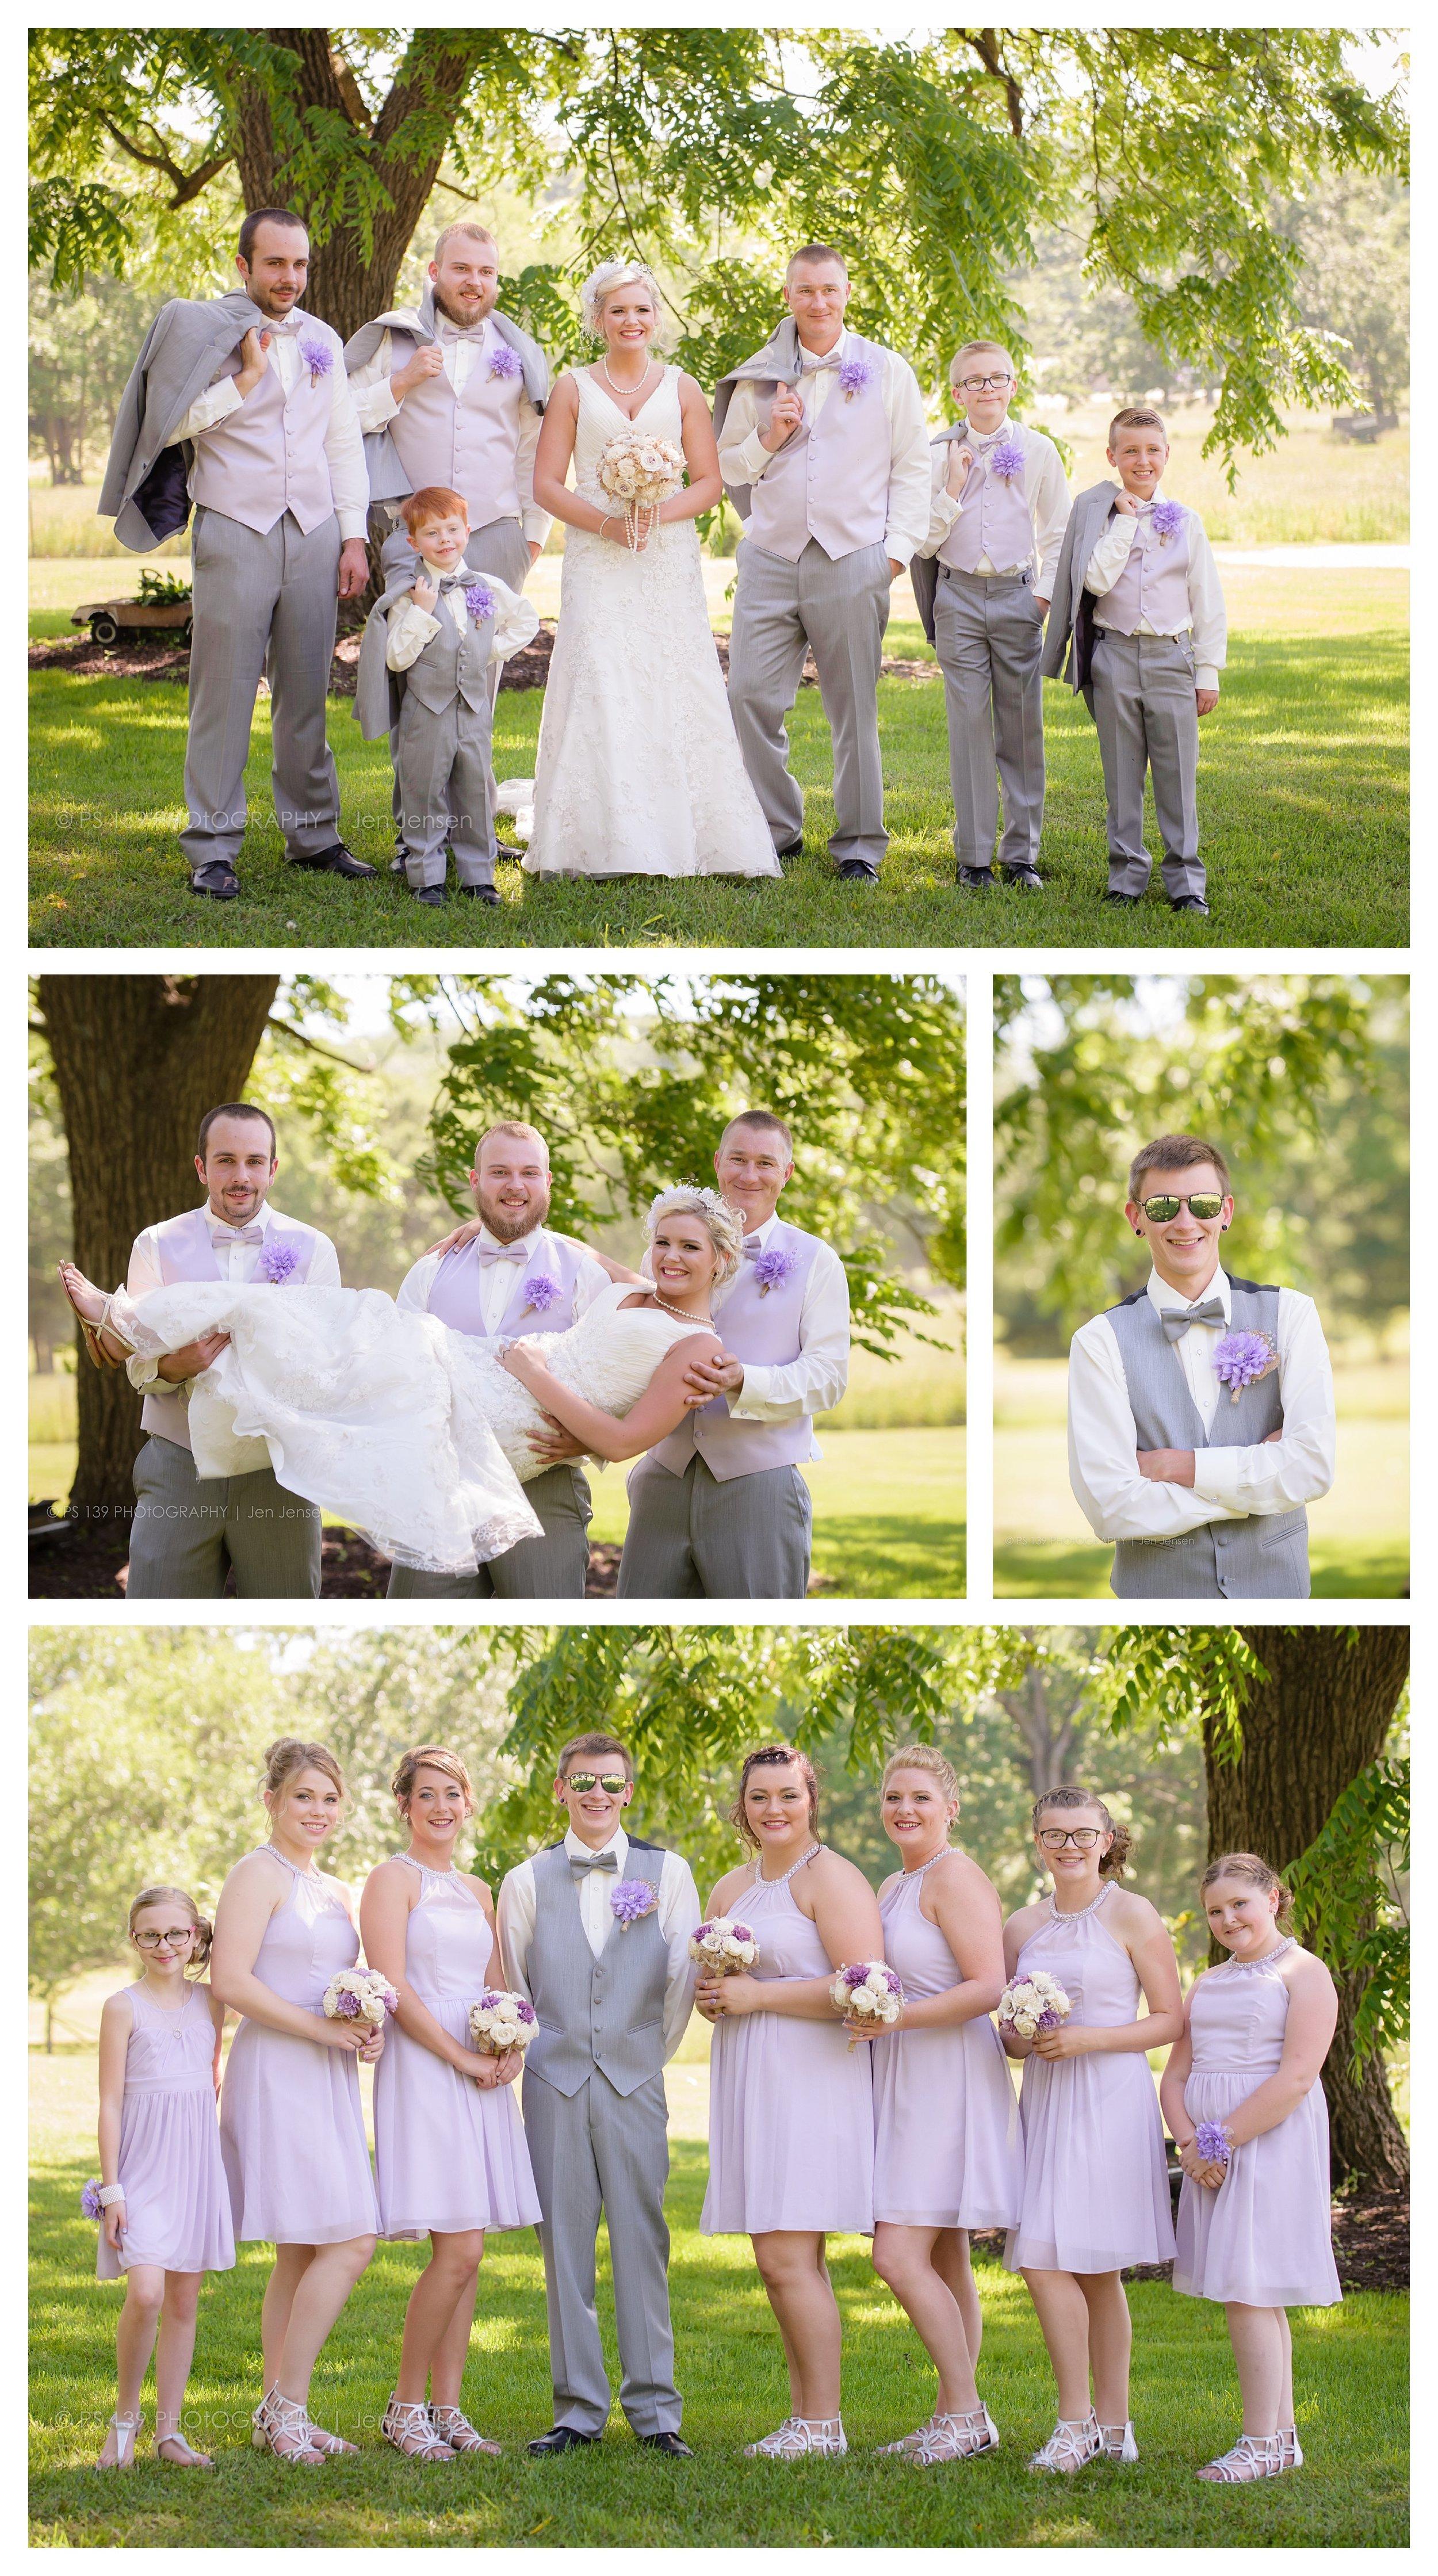 oregon Illinois oak lane farm wisconsin wedding photographer bayfield wi ps 139 photography jen jensen_0247.jpg